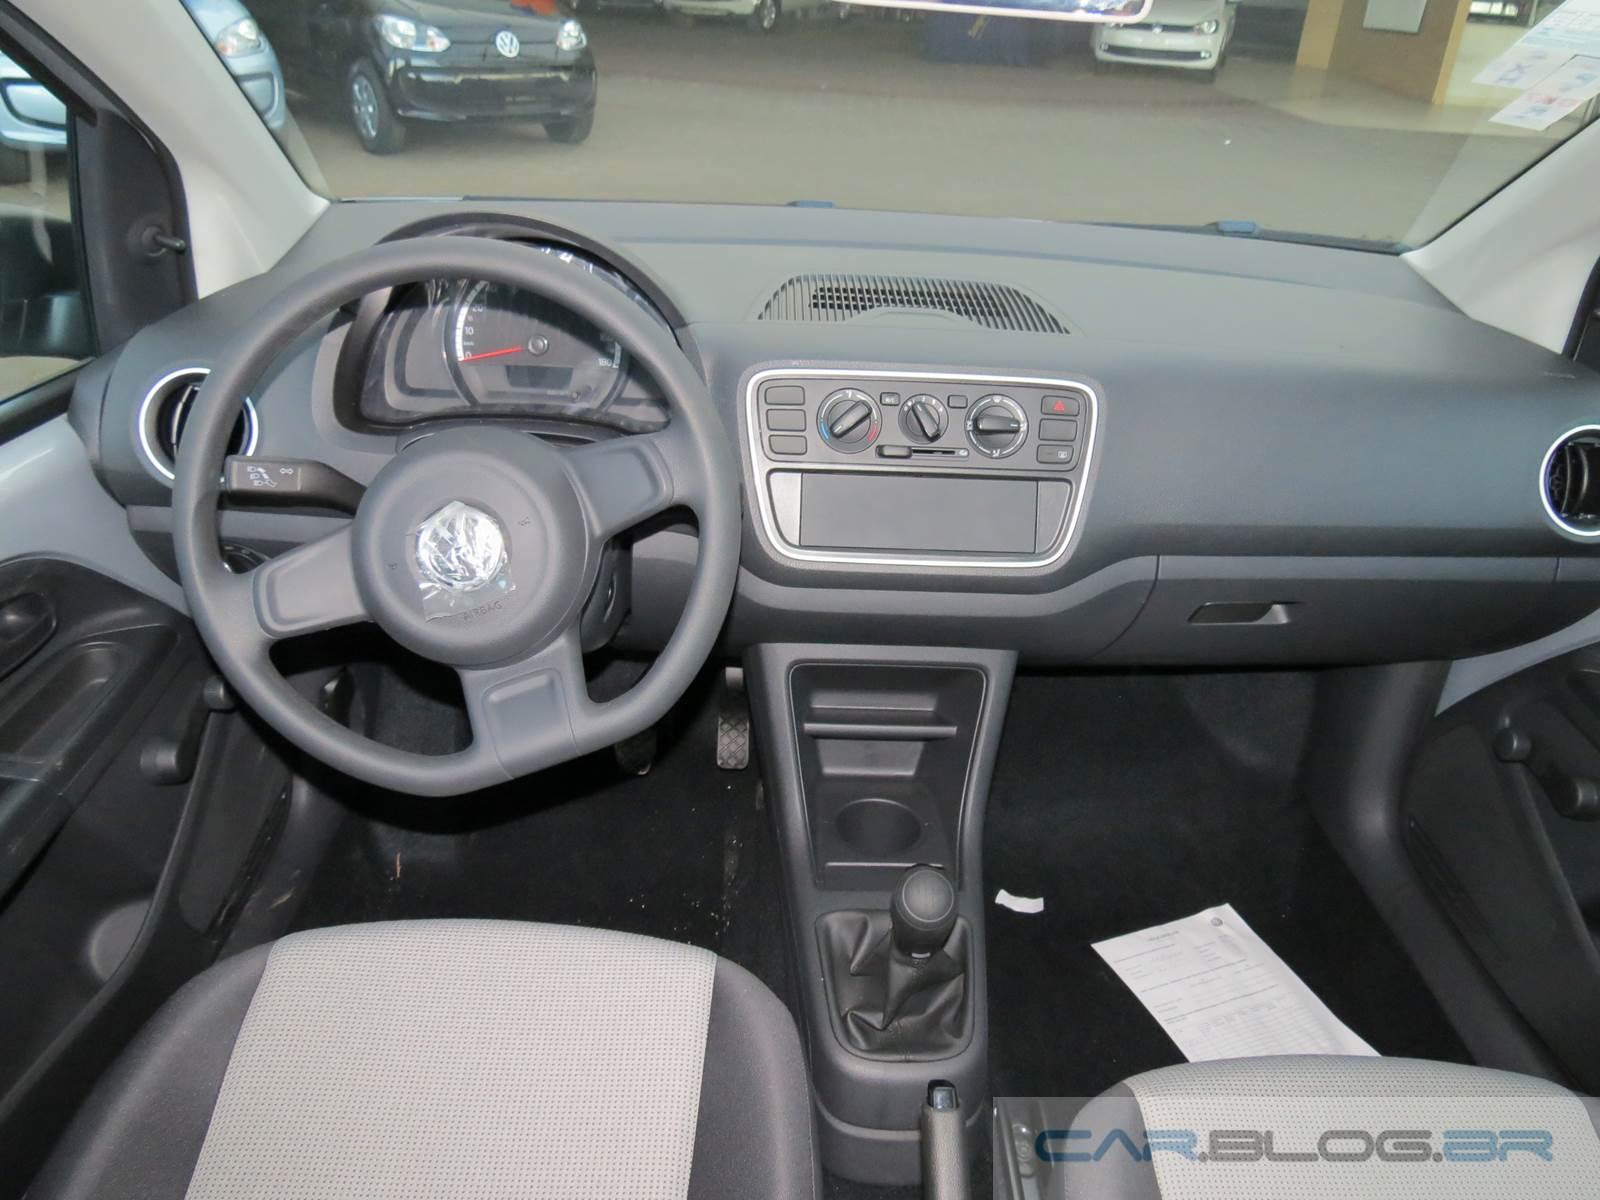 Volkswagen up! completo - Prata Sirius - interior